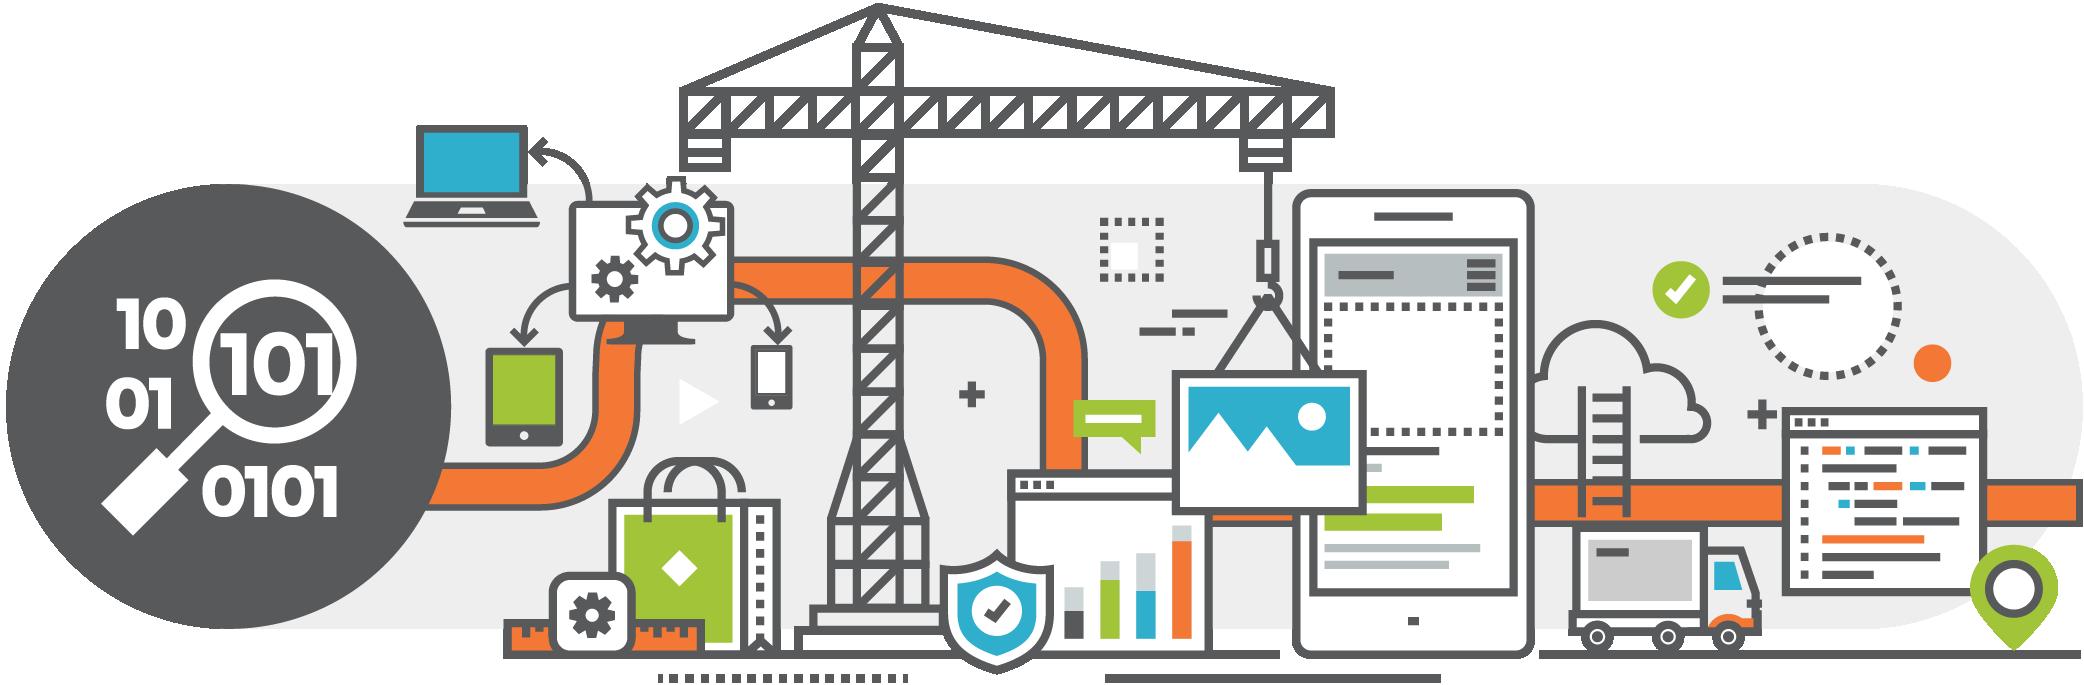 TM-Services_Infographics_003_Web_Development